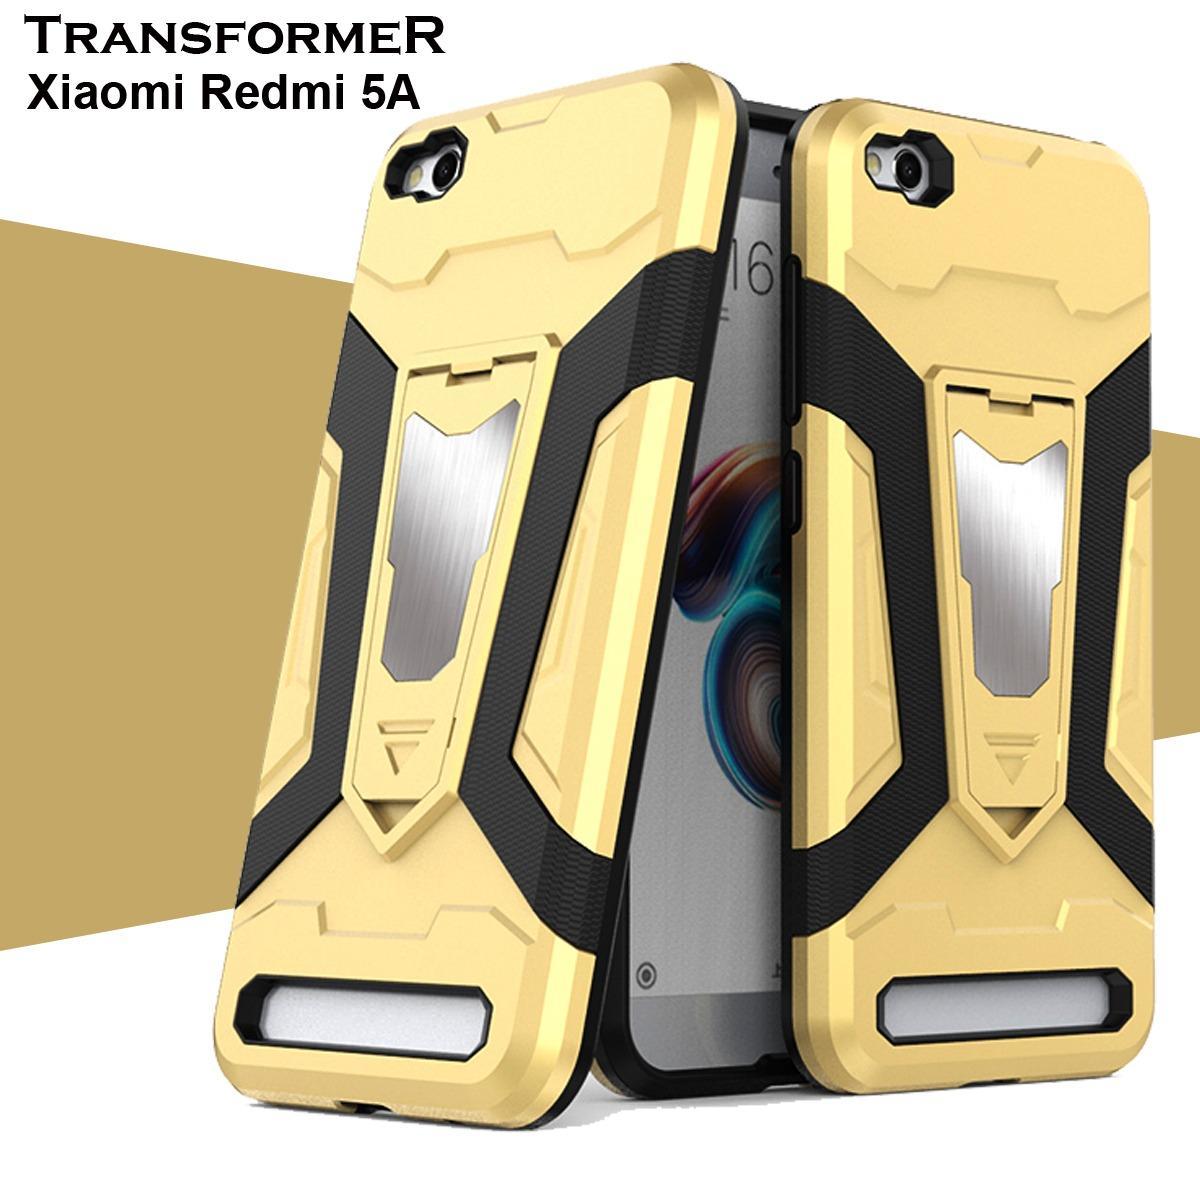 Case Iron Man For Xiaomi Redmi 4a Robot Transformer Ironman Limited Hybrid Standing 5a